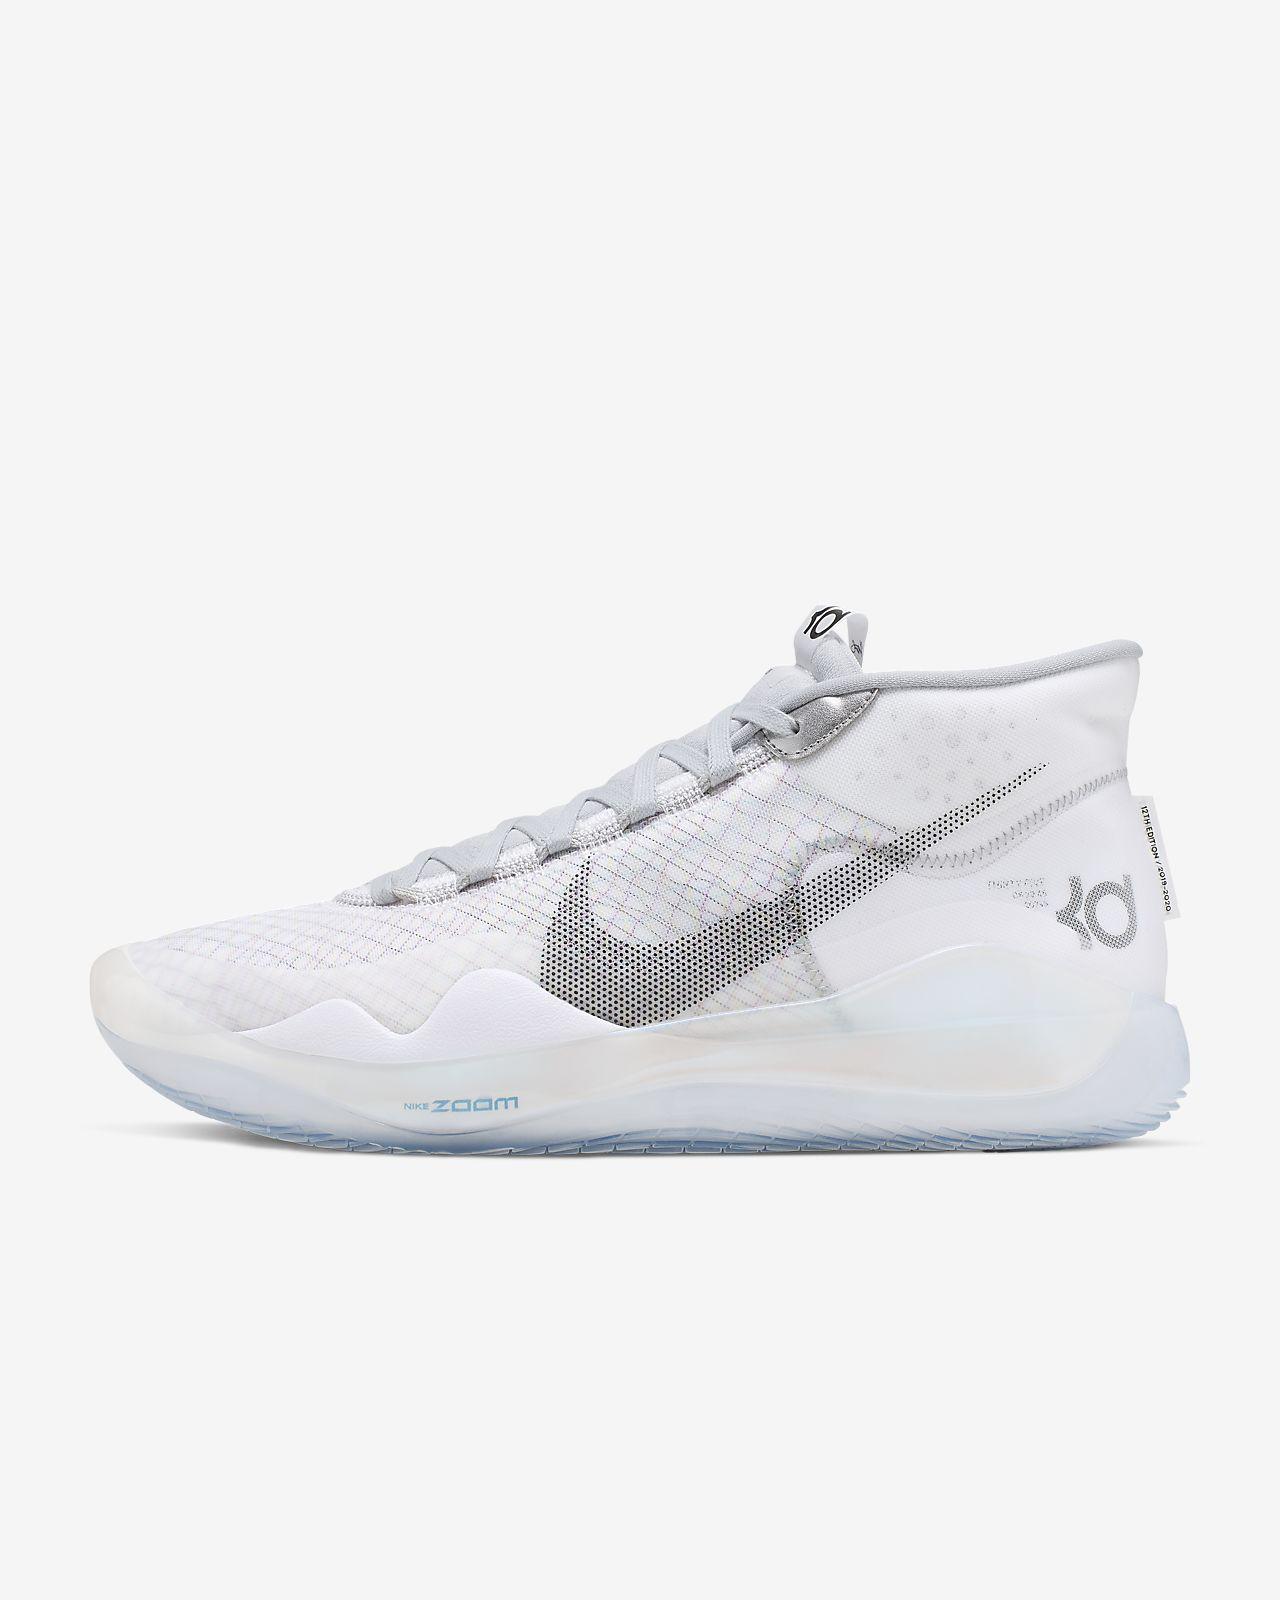 Nike Zoom KD12 Basketball Shoe